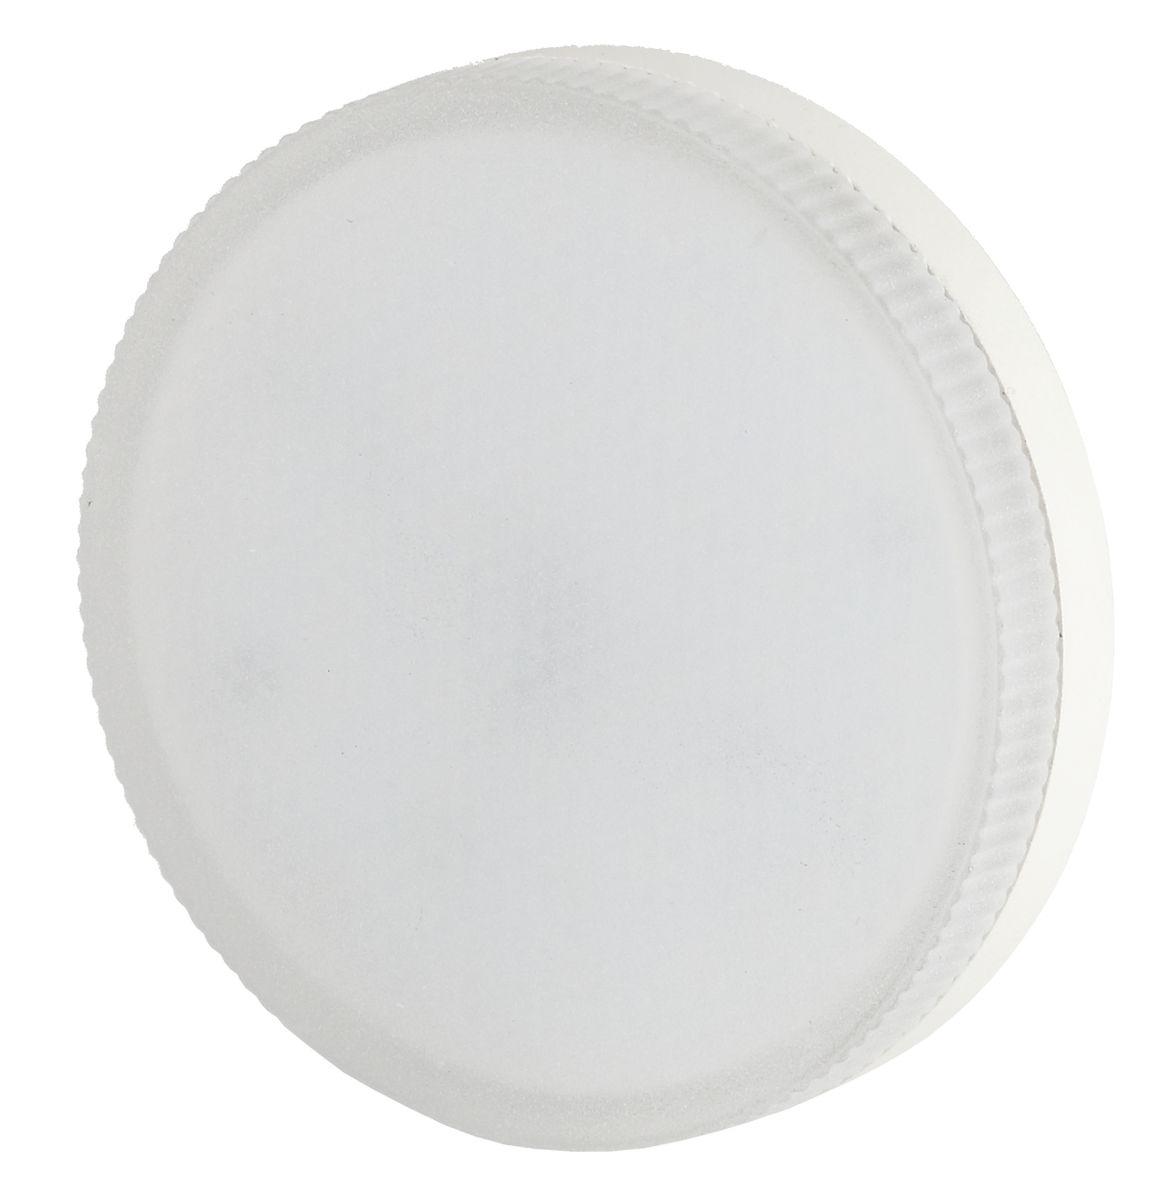 Лампа светодиодная ЭРА, LED smd GX-7w-827-GX53. Б00032925055398661383